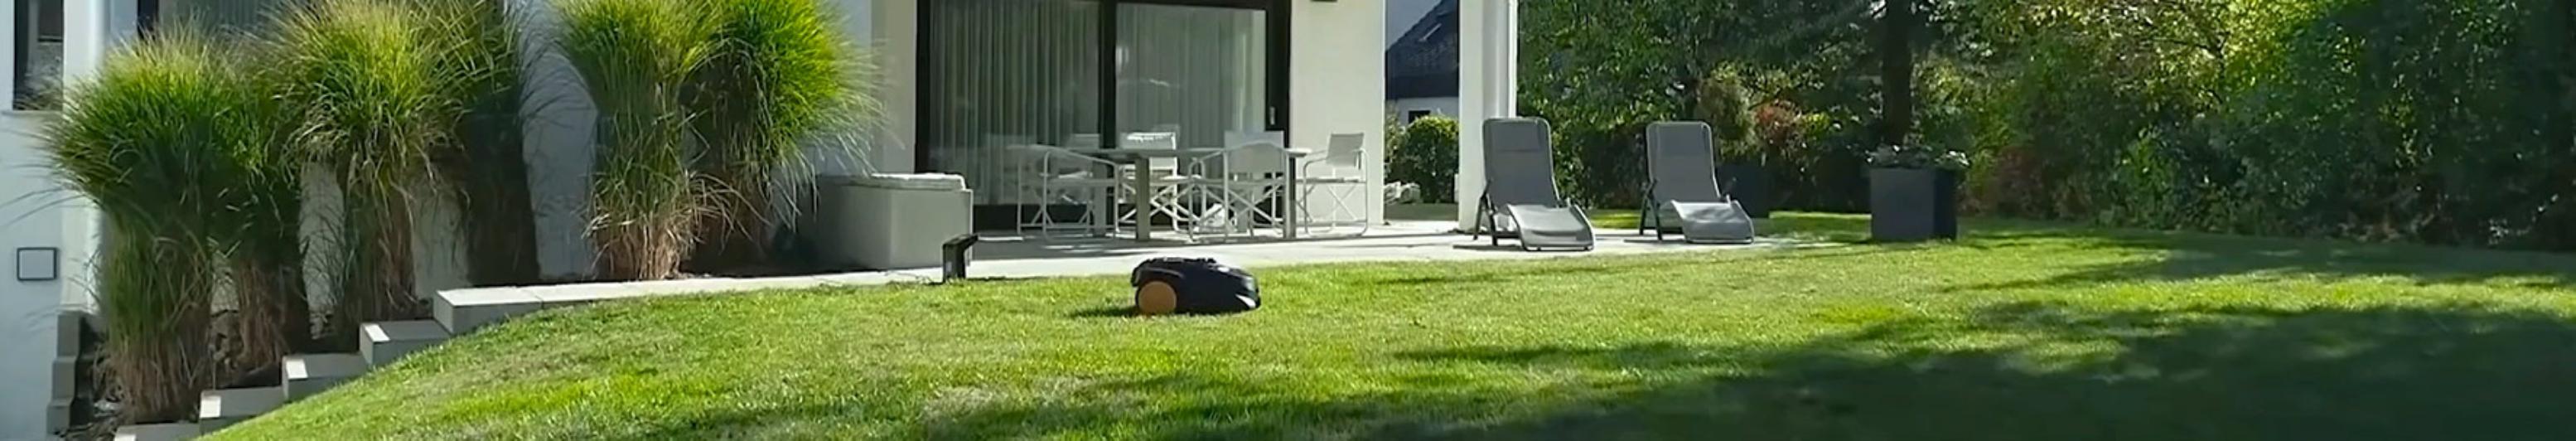 banner-robot-fromvideo_06-2x